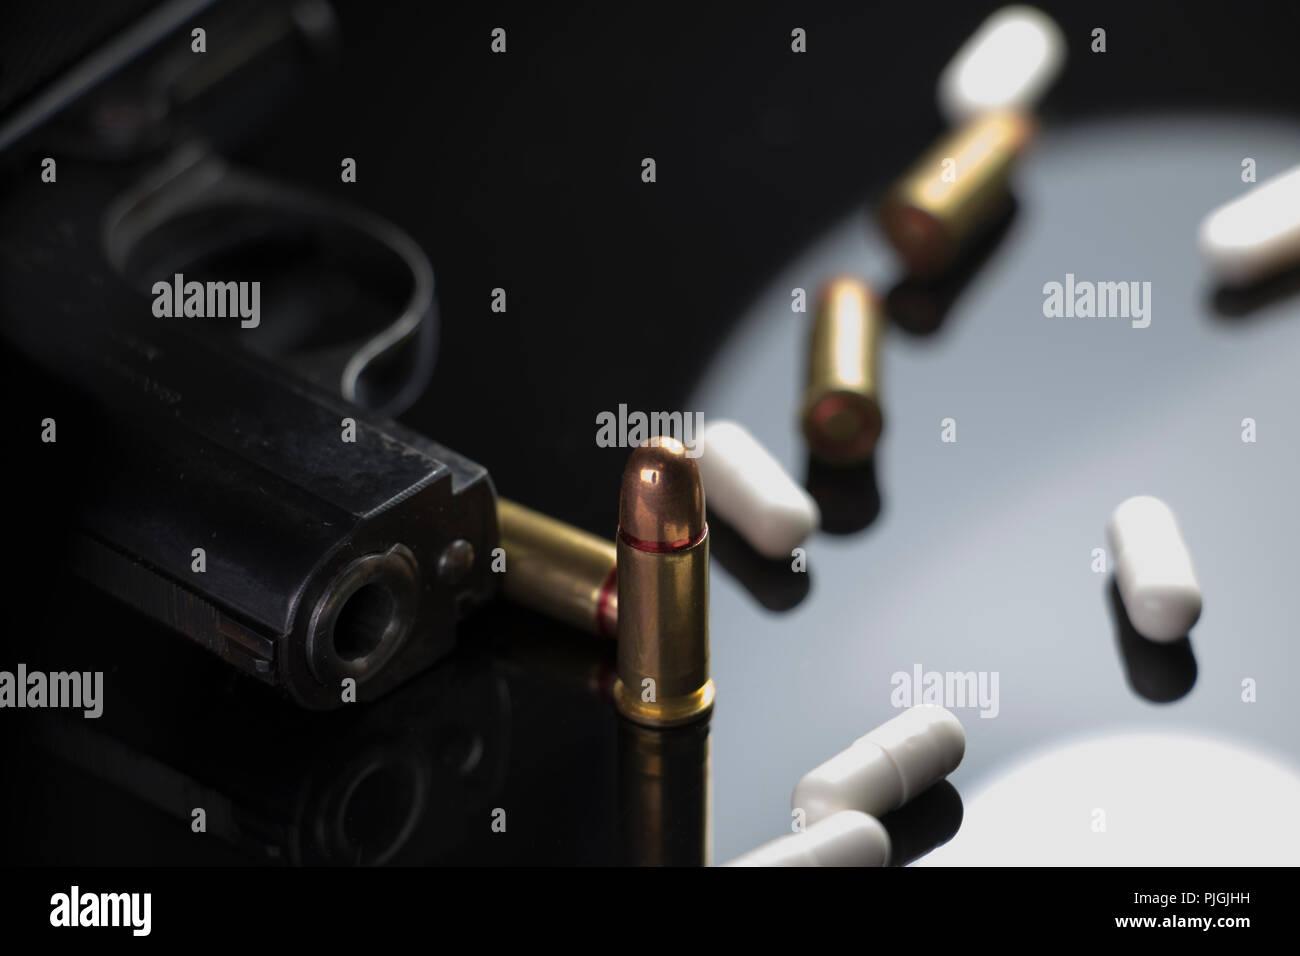 Gun, Bullets, and pills. School violence and antipsychotic drugs.School shootings, bullying and gun violence. American Issues. - Stock Image